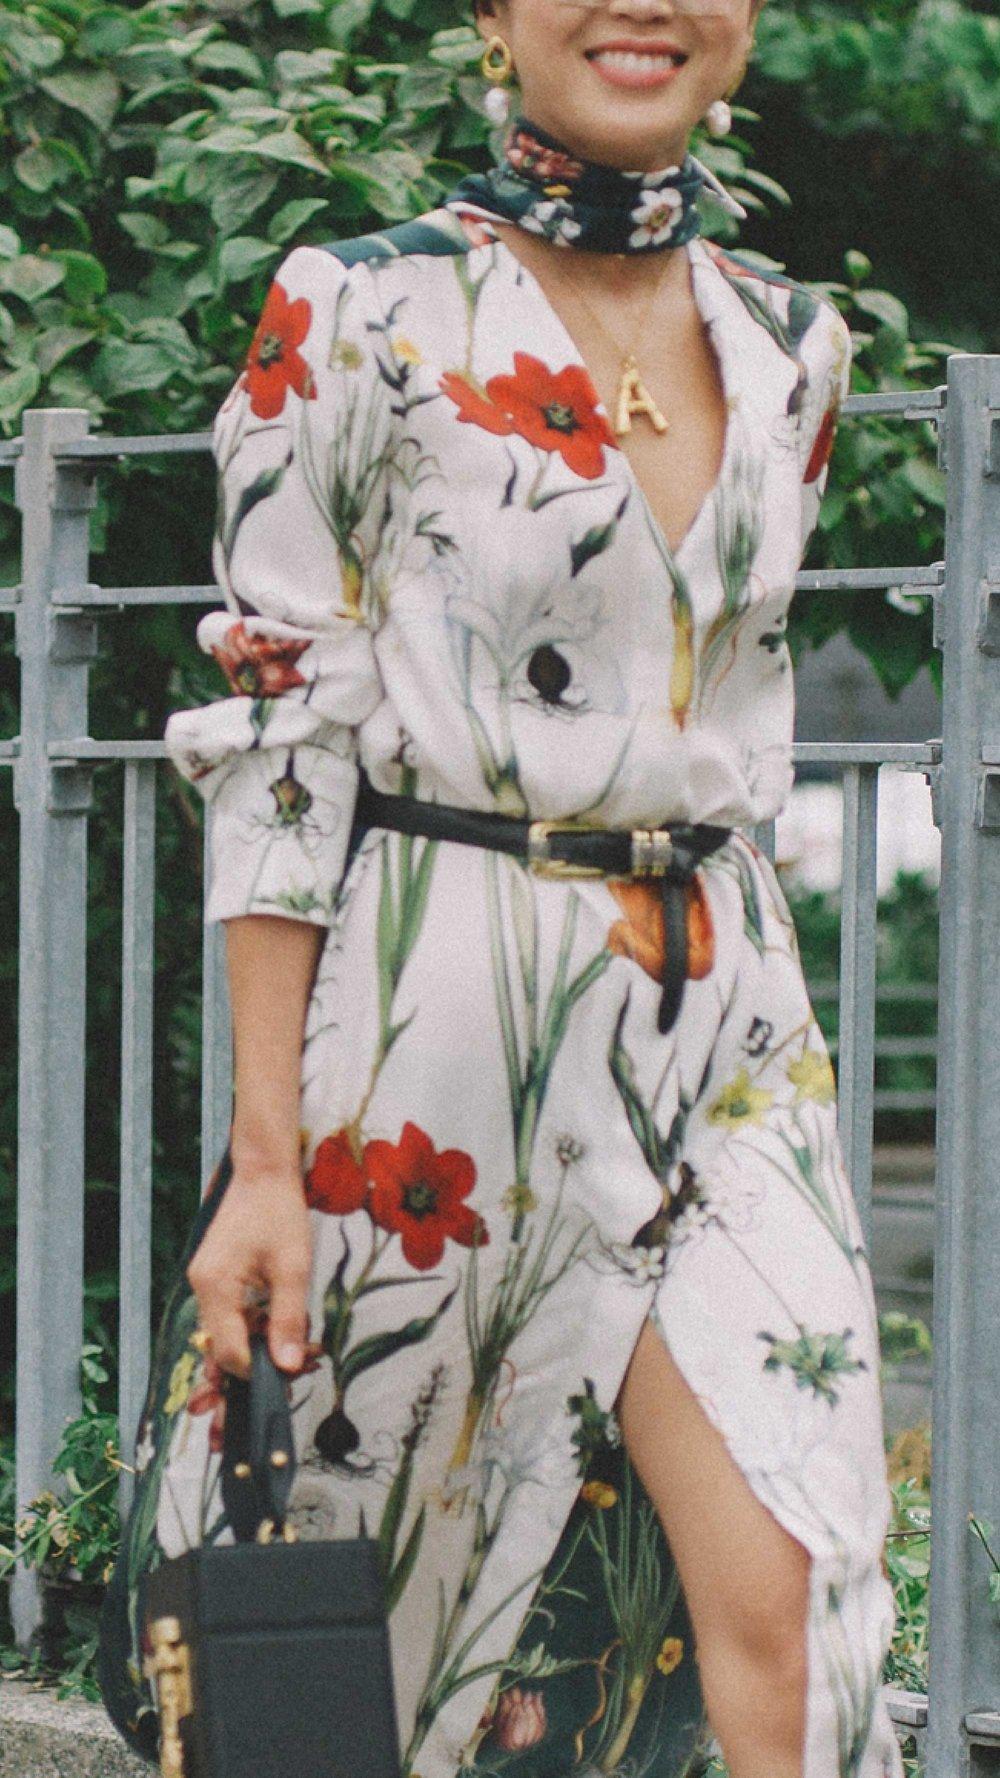 New-York-Fashion-Week-NYFW-SS18-street-style-day-five-SS18-1.jpg